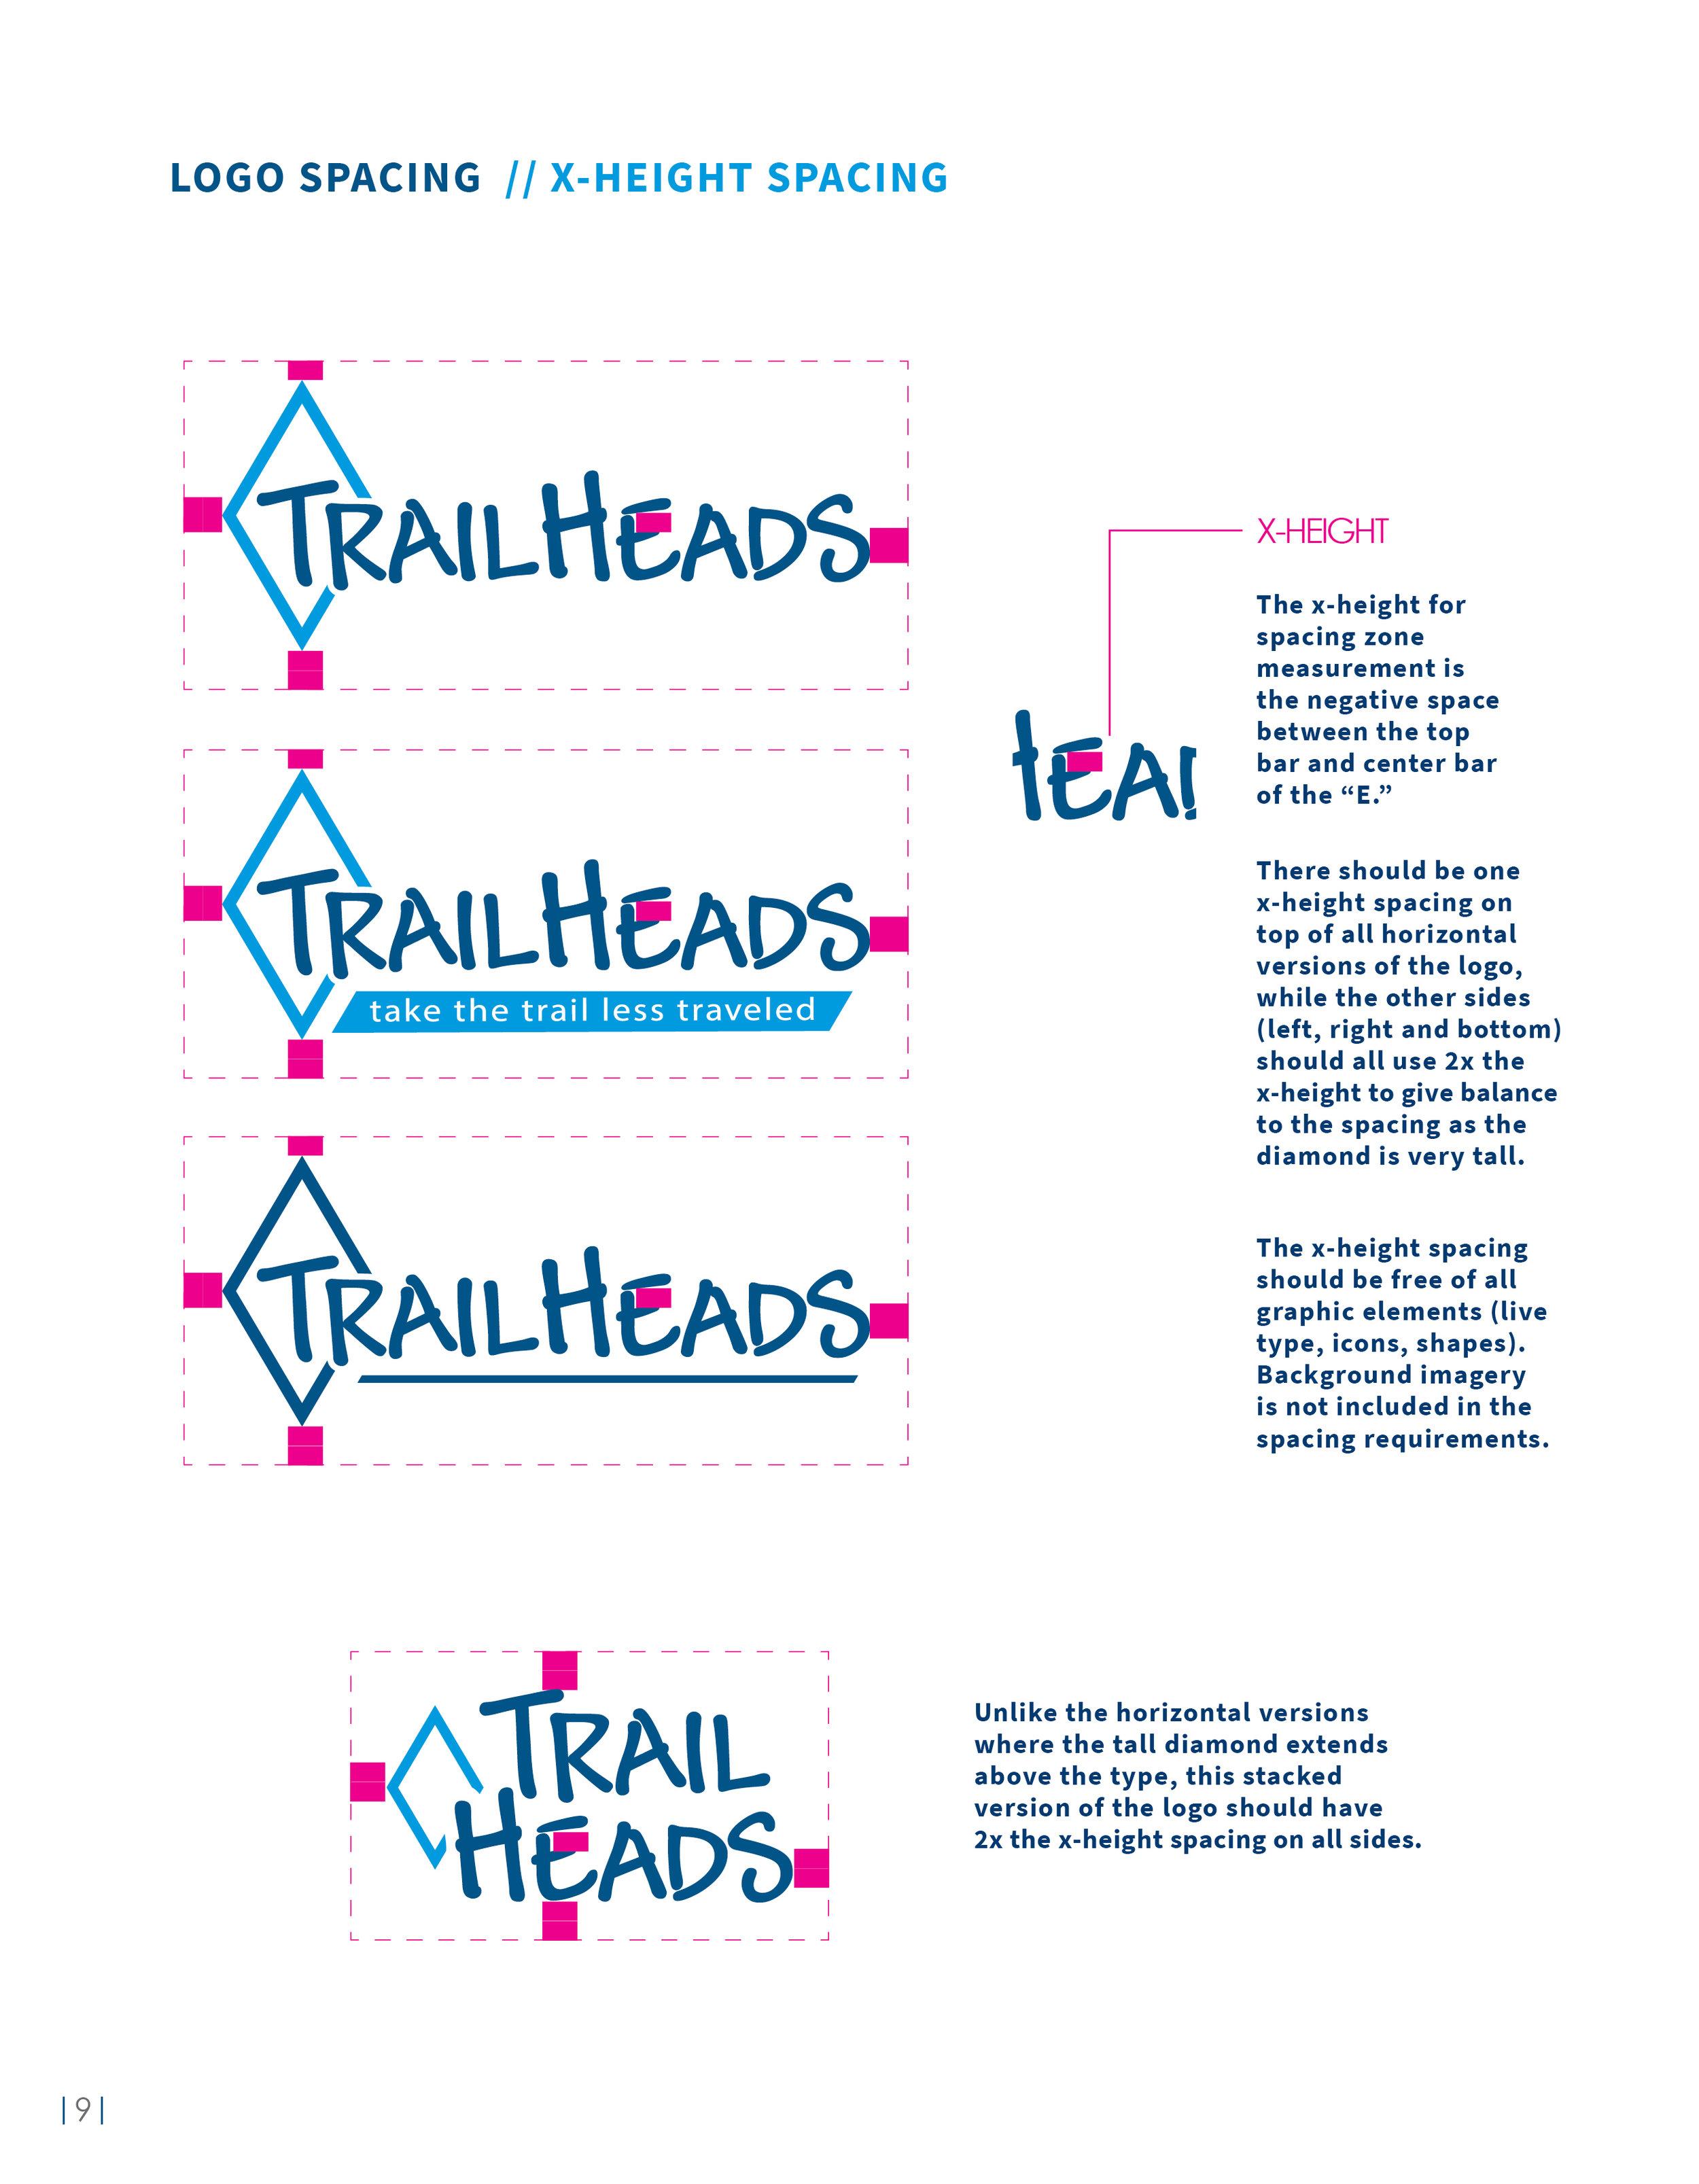 apparel-company-brand-guidelines-design-by-jordan-fretz-design-19.jpg